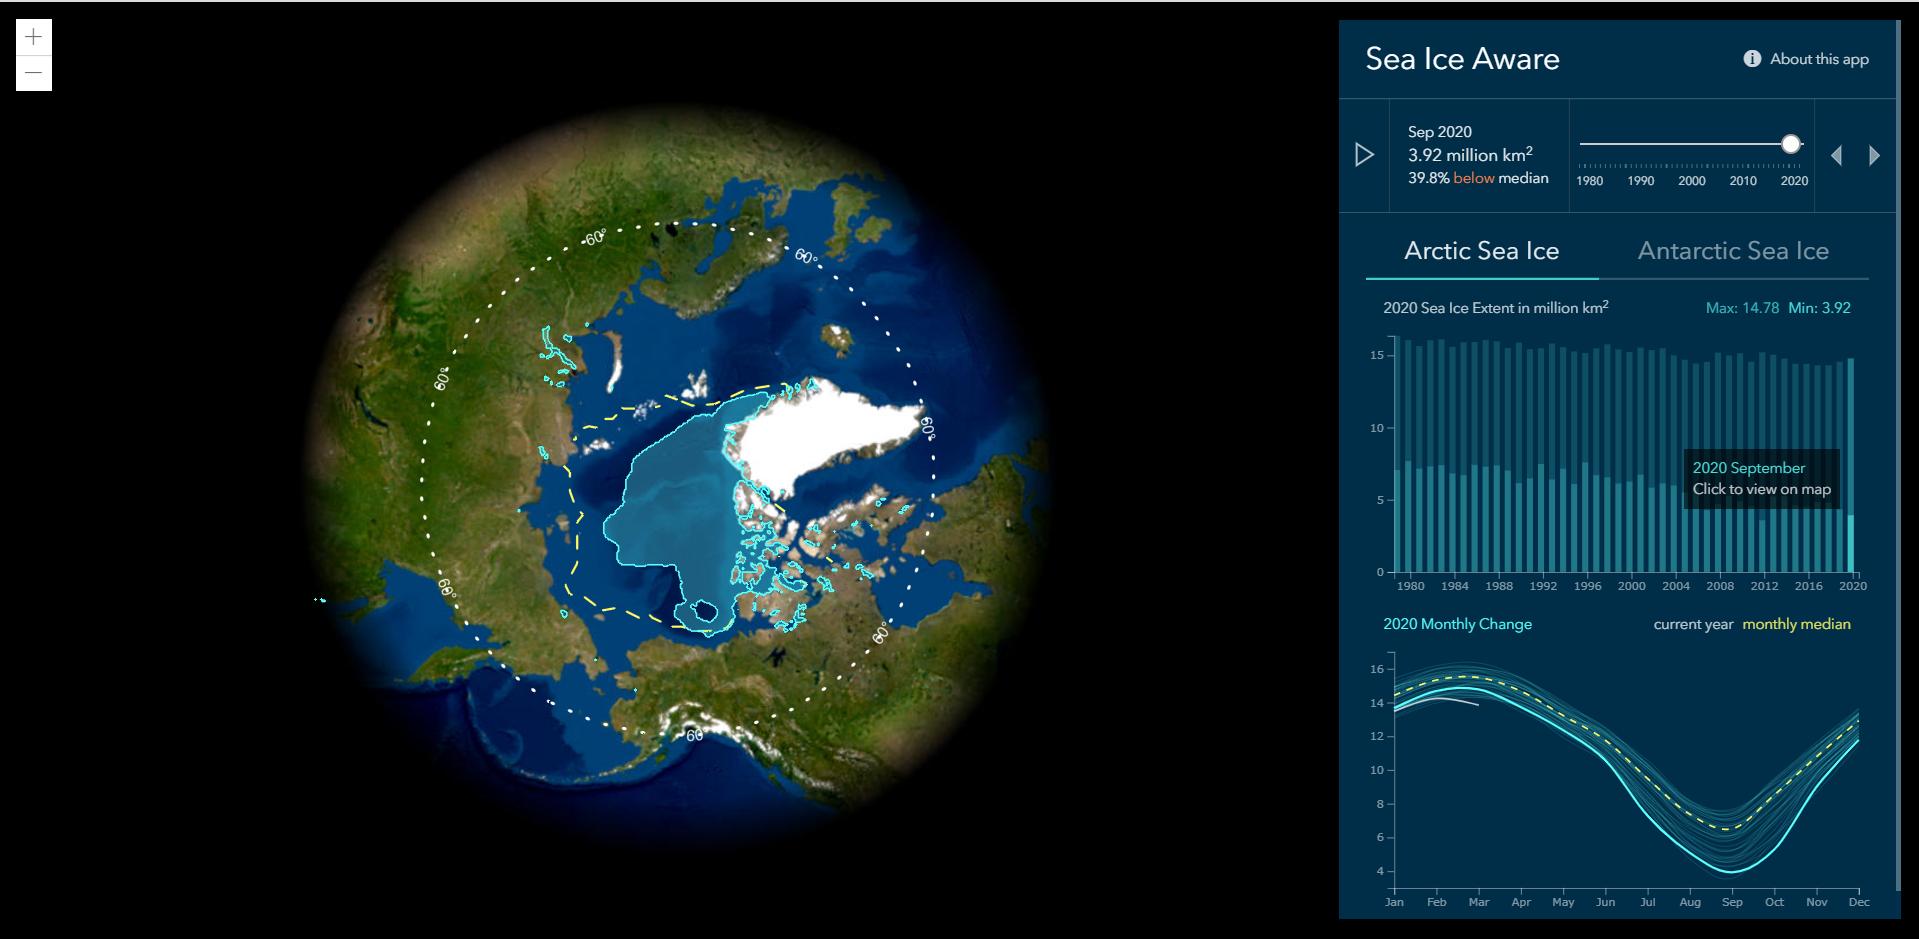 Sea Ice Aware